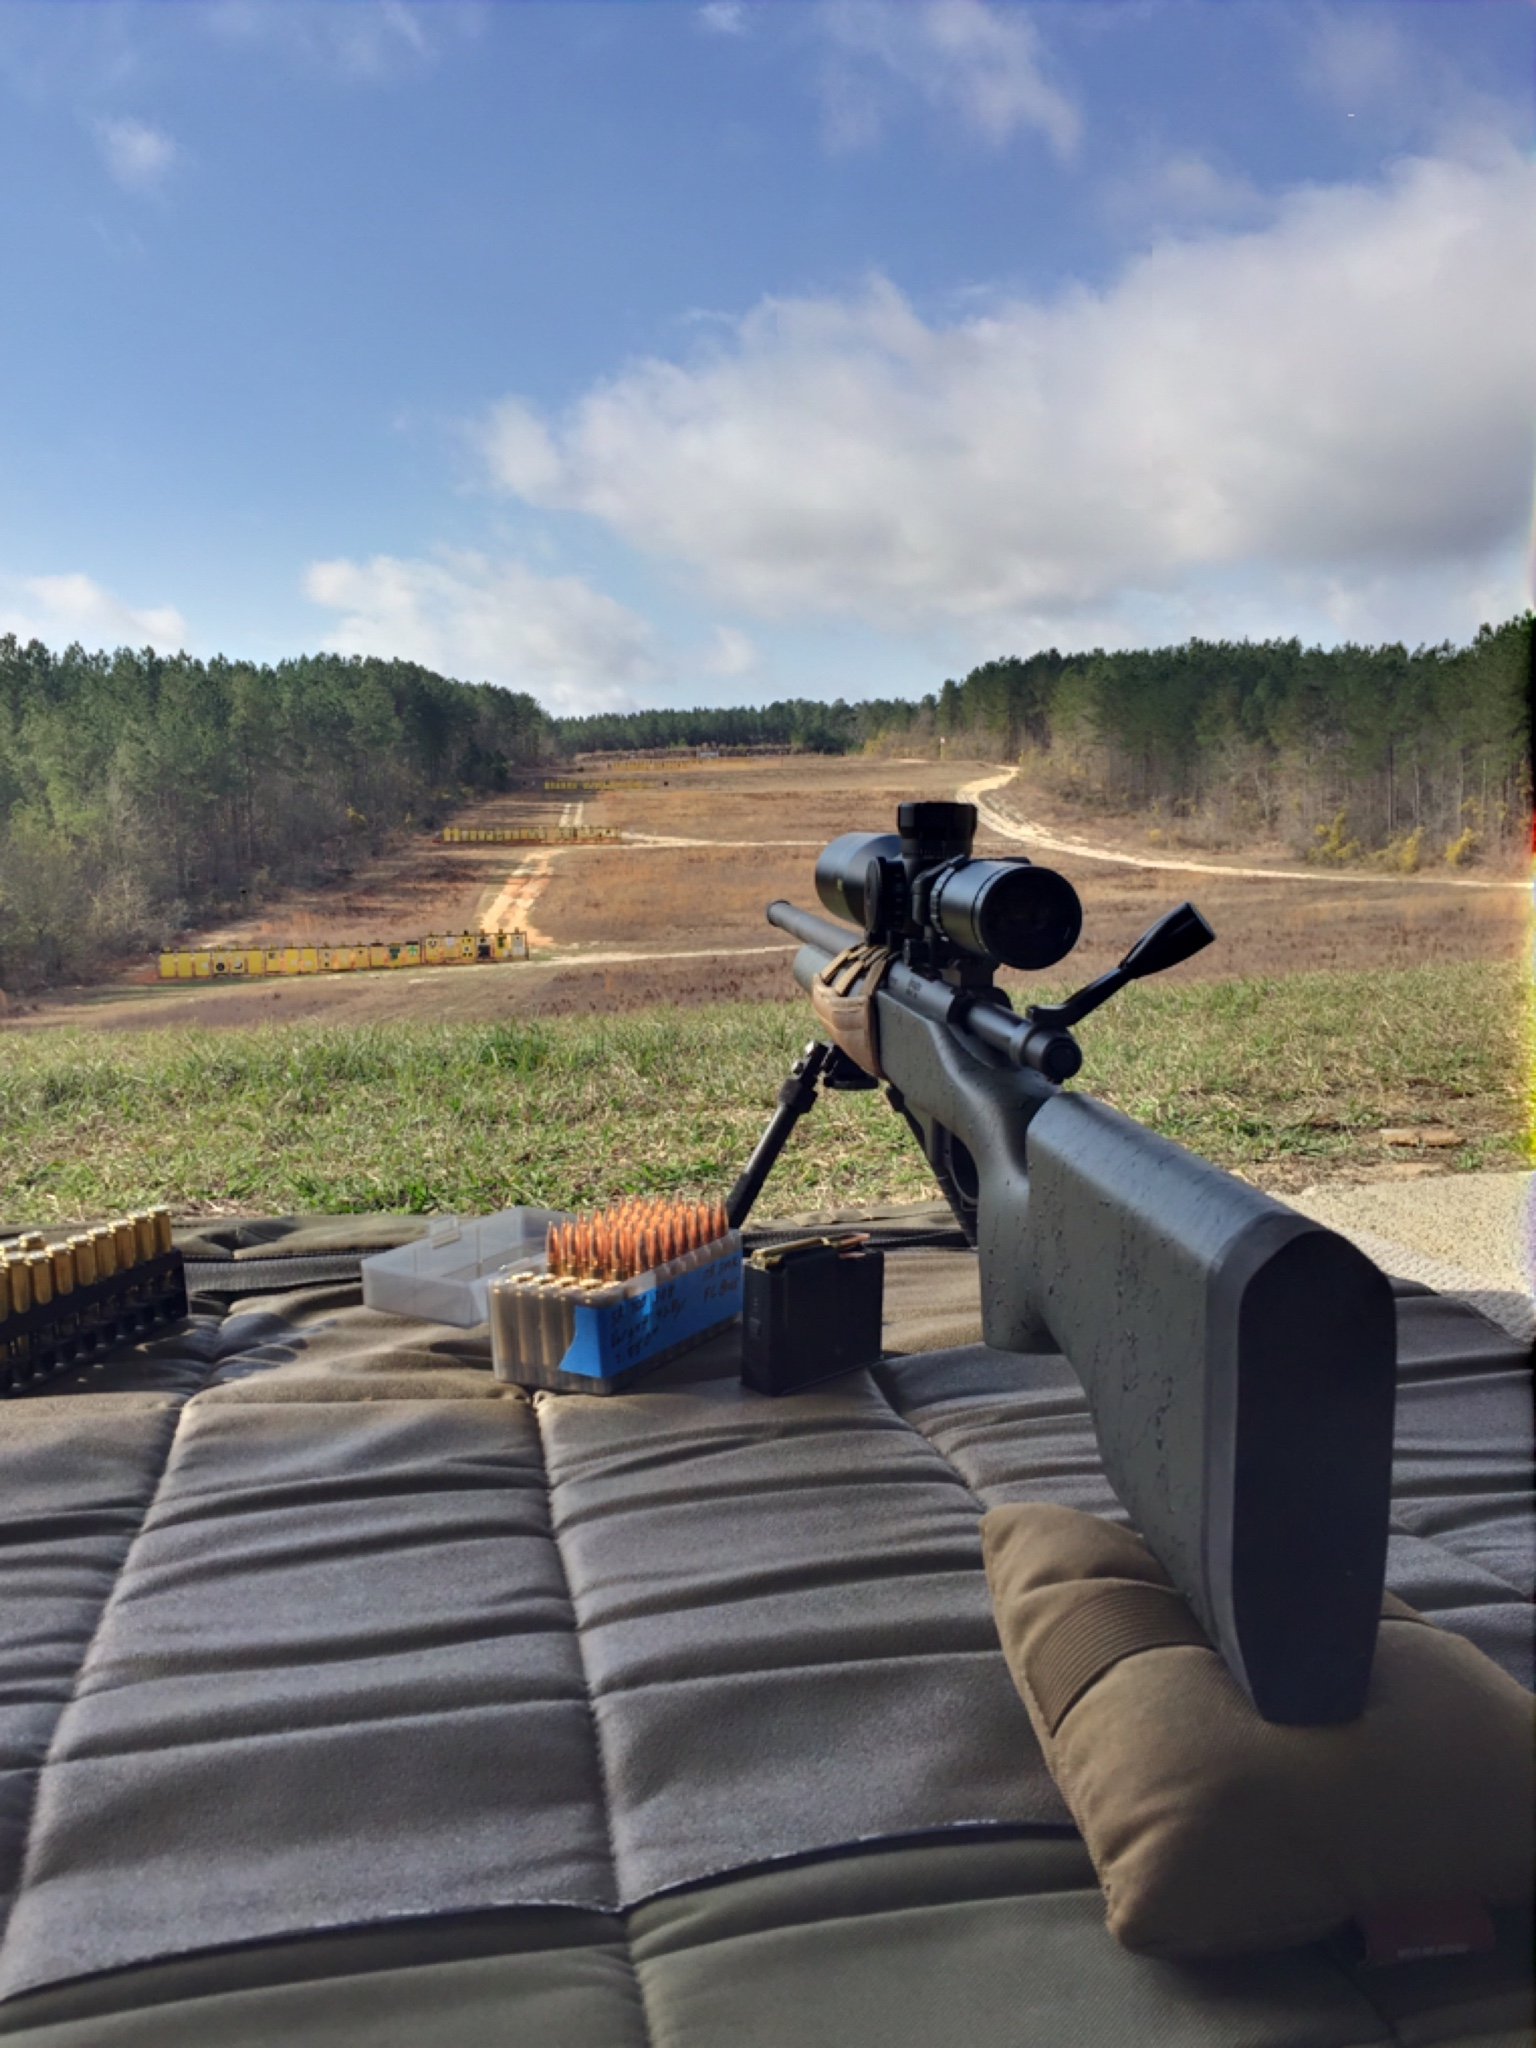 NC/SC - Remington 5r 308, Grayboe Stock, PTG DBM bottom